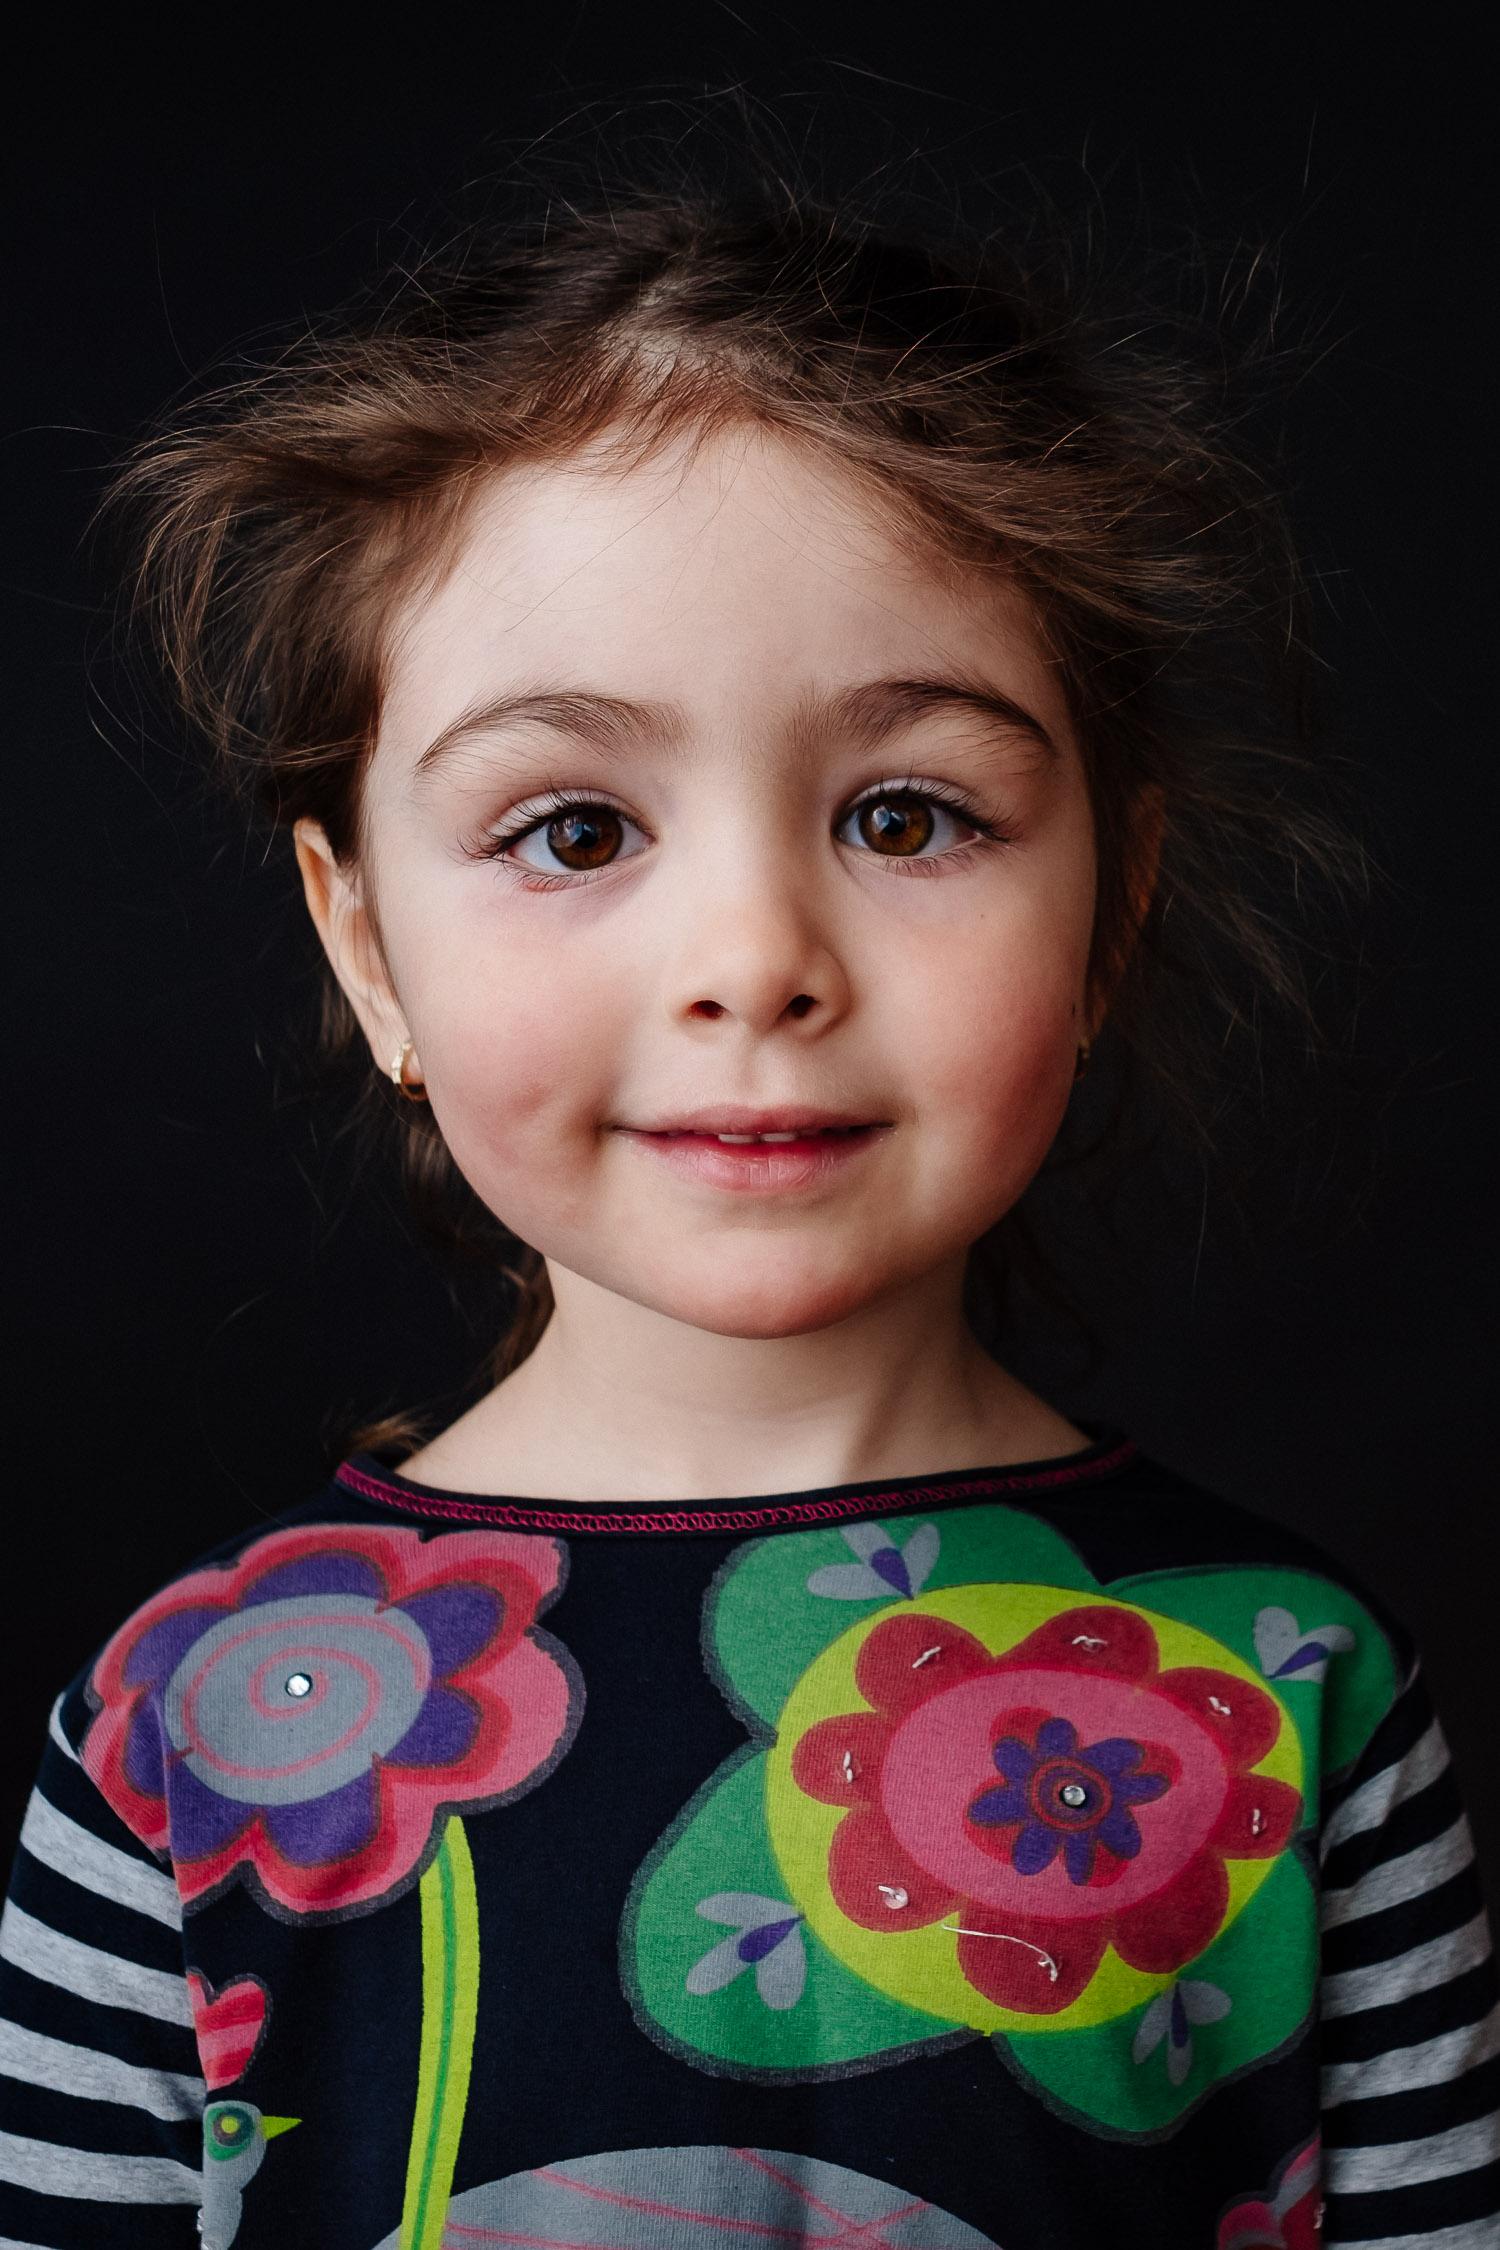 steven-h-perreault-photography-portrait-6481.jpg